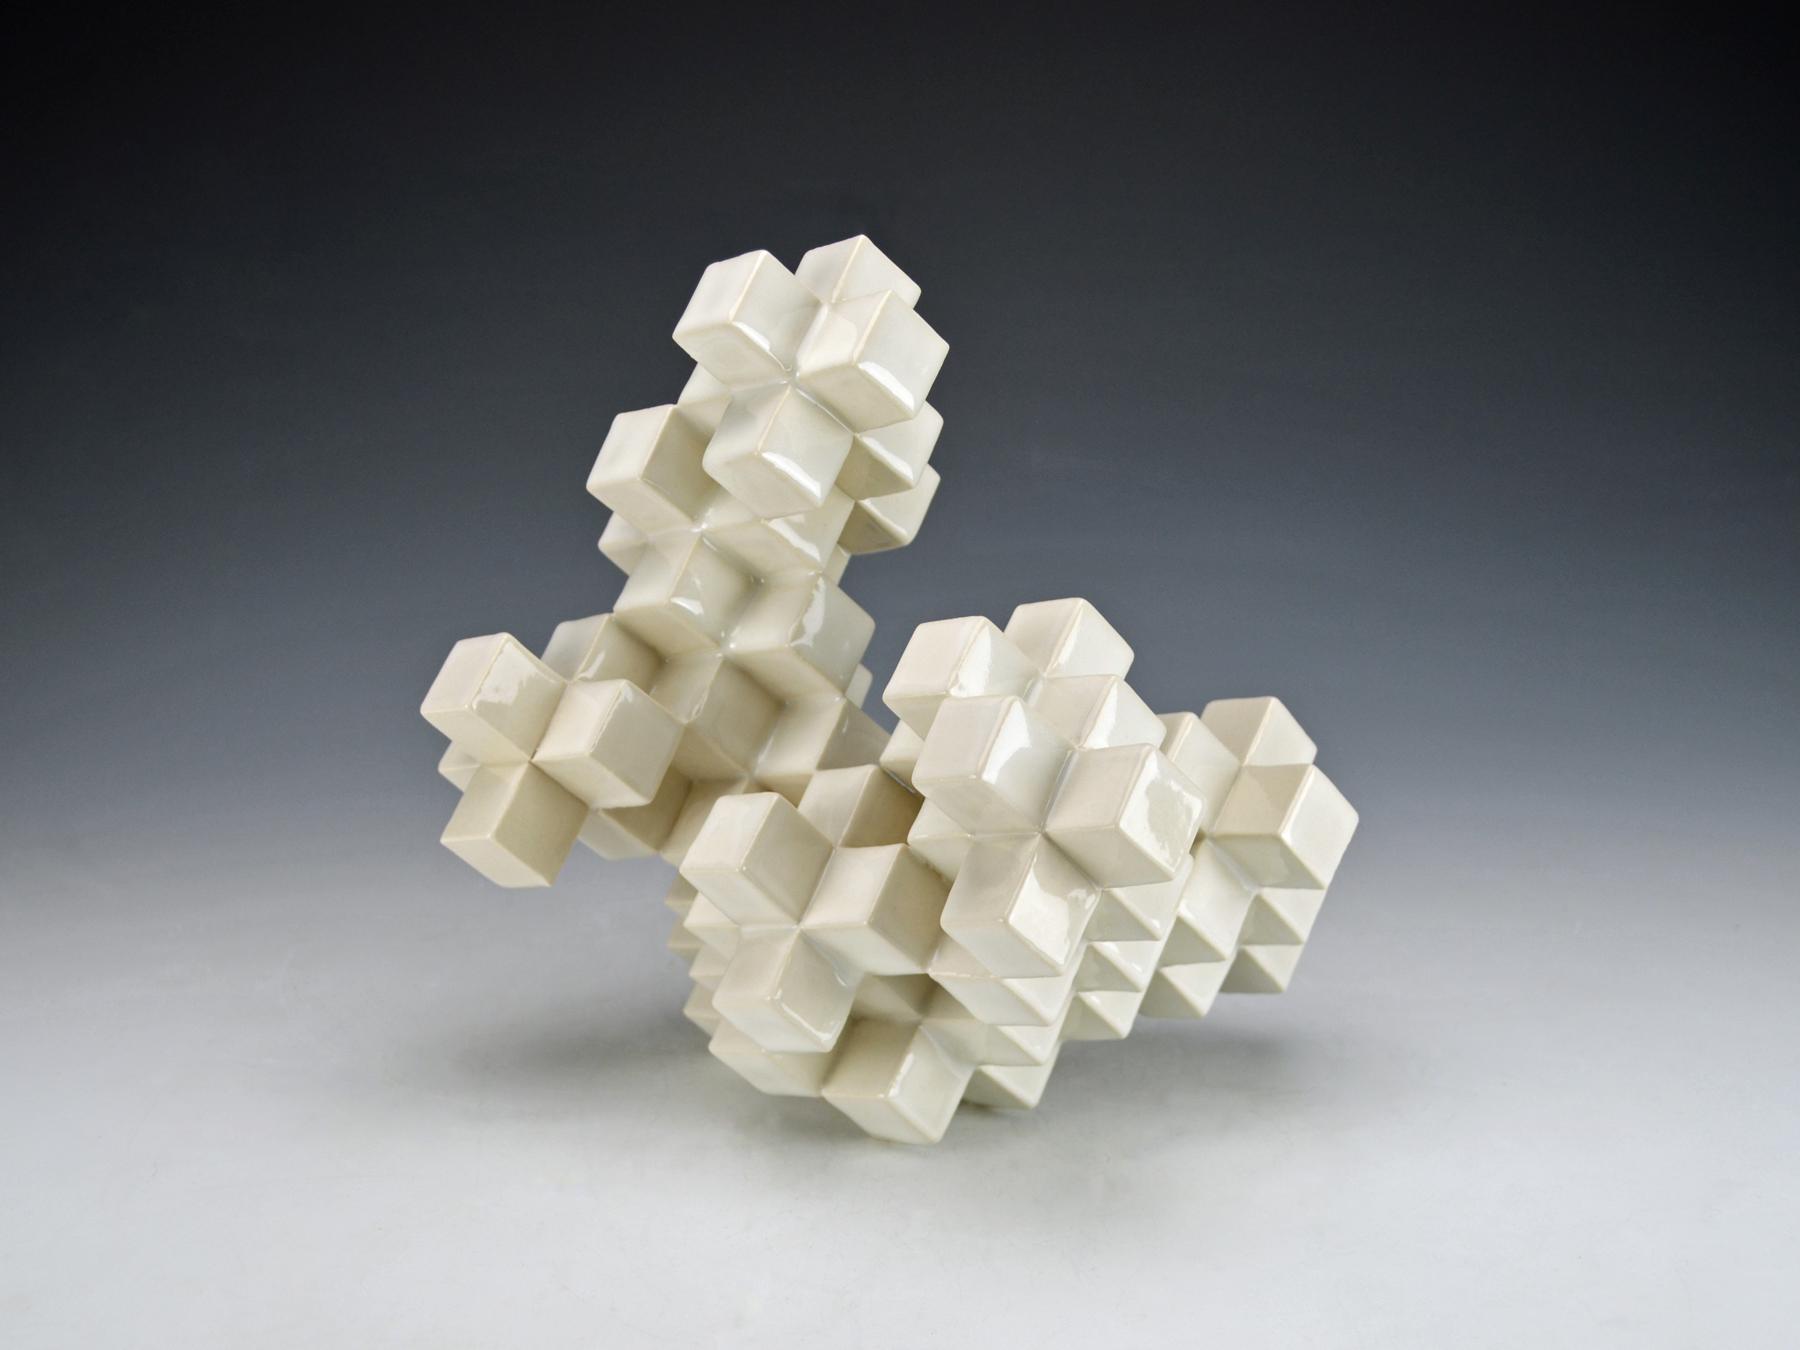 Cubic Series: Construction II  |  11 x 9 x 9 inches  |  Porcelain, Glaze  |  2017